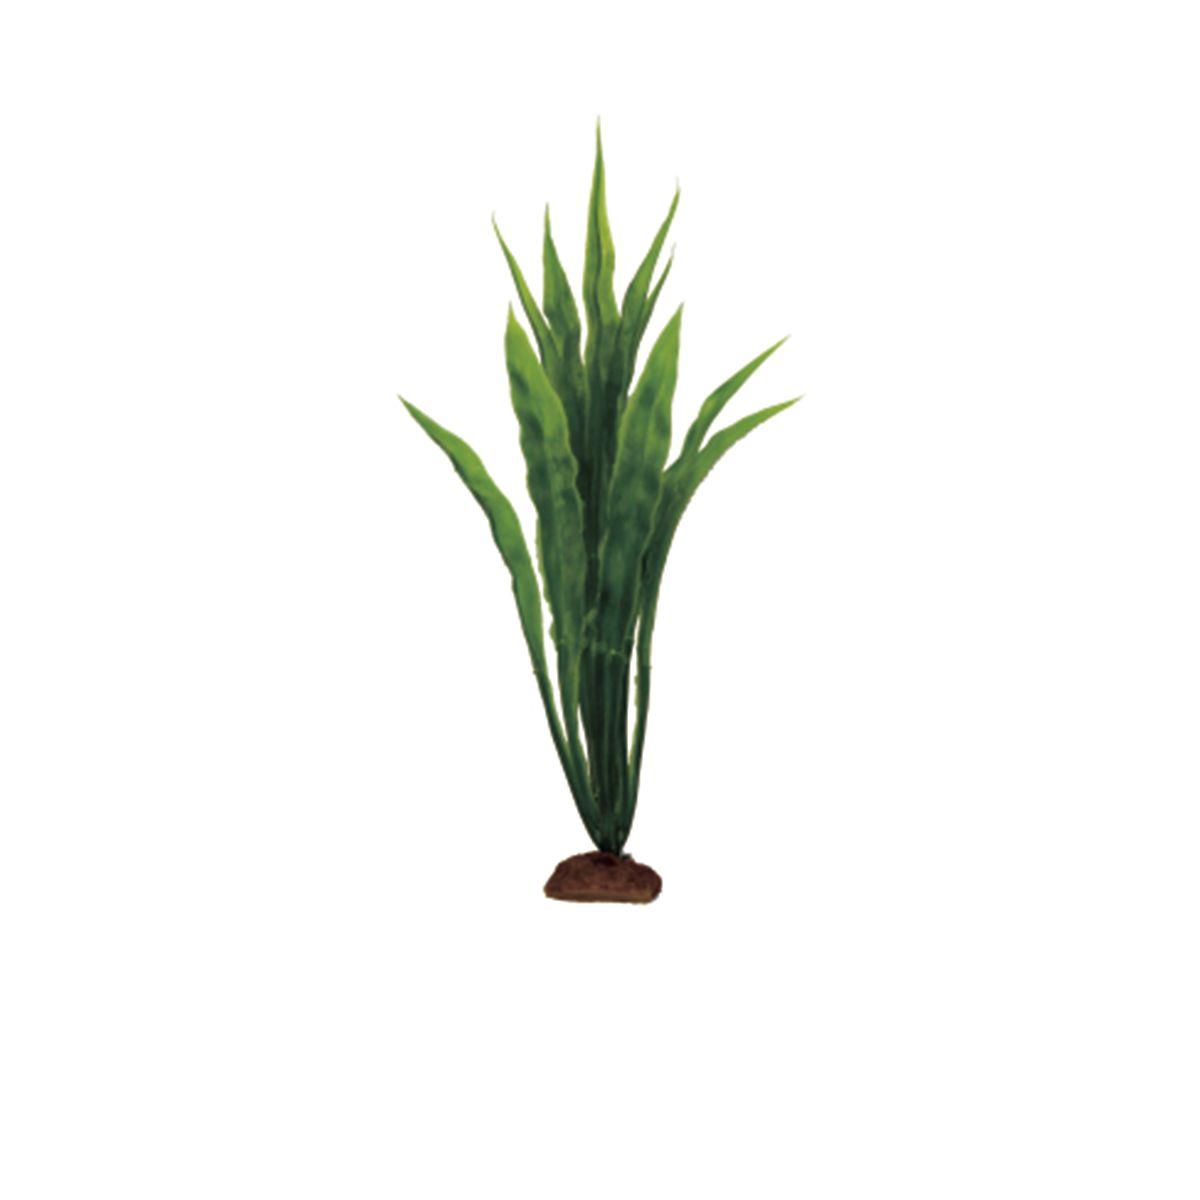 Растение для аквариума ArtUniq Эхинодорус боливийский, высота 12 см, 6 шт0120710Растение для аквариума ArtUniq Эхинодорус боливийский, высота 12 см, 6 шт